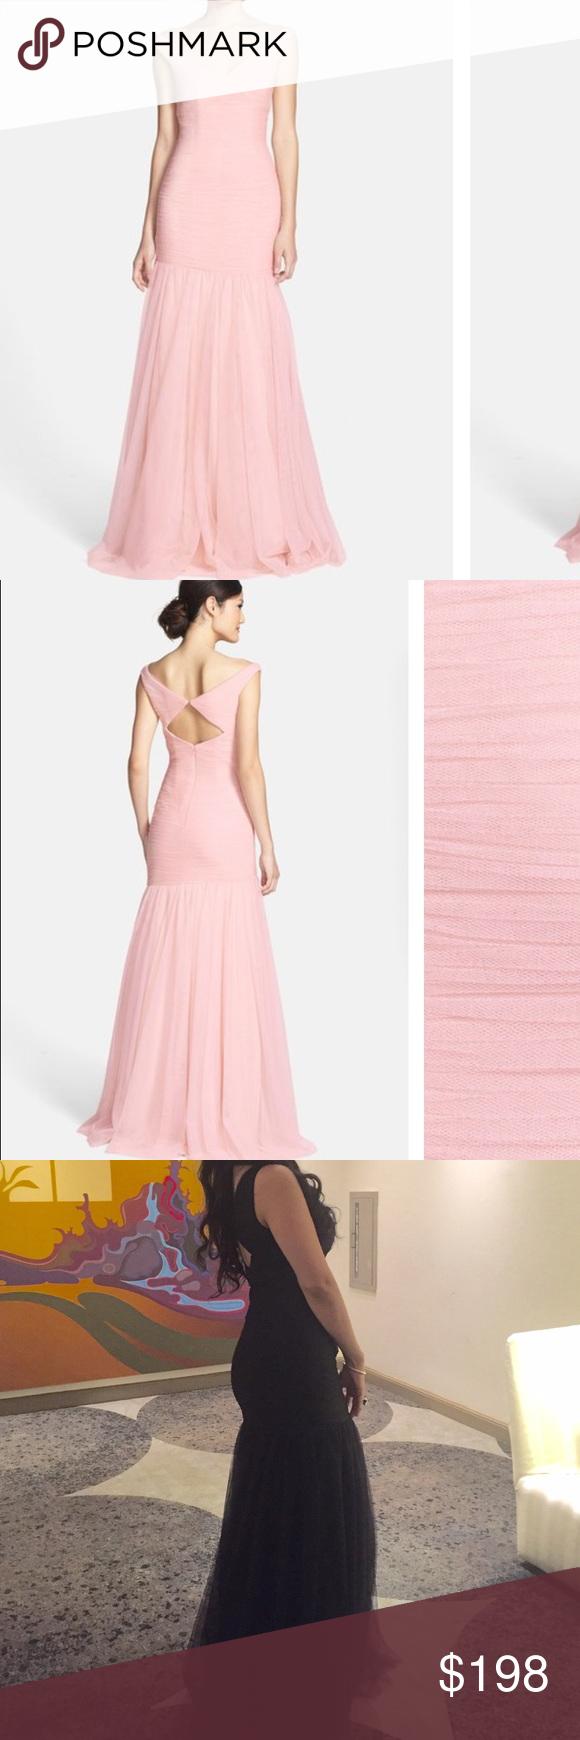 Monique Lhuillier V-Neck Shirred Tulle Dress